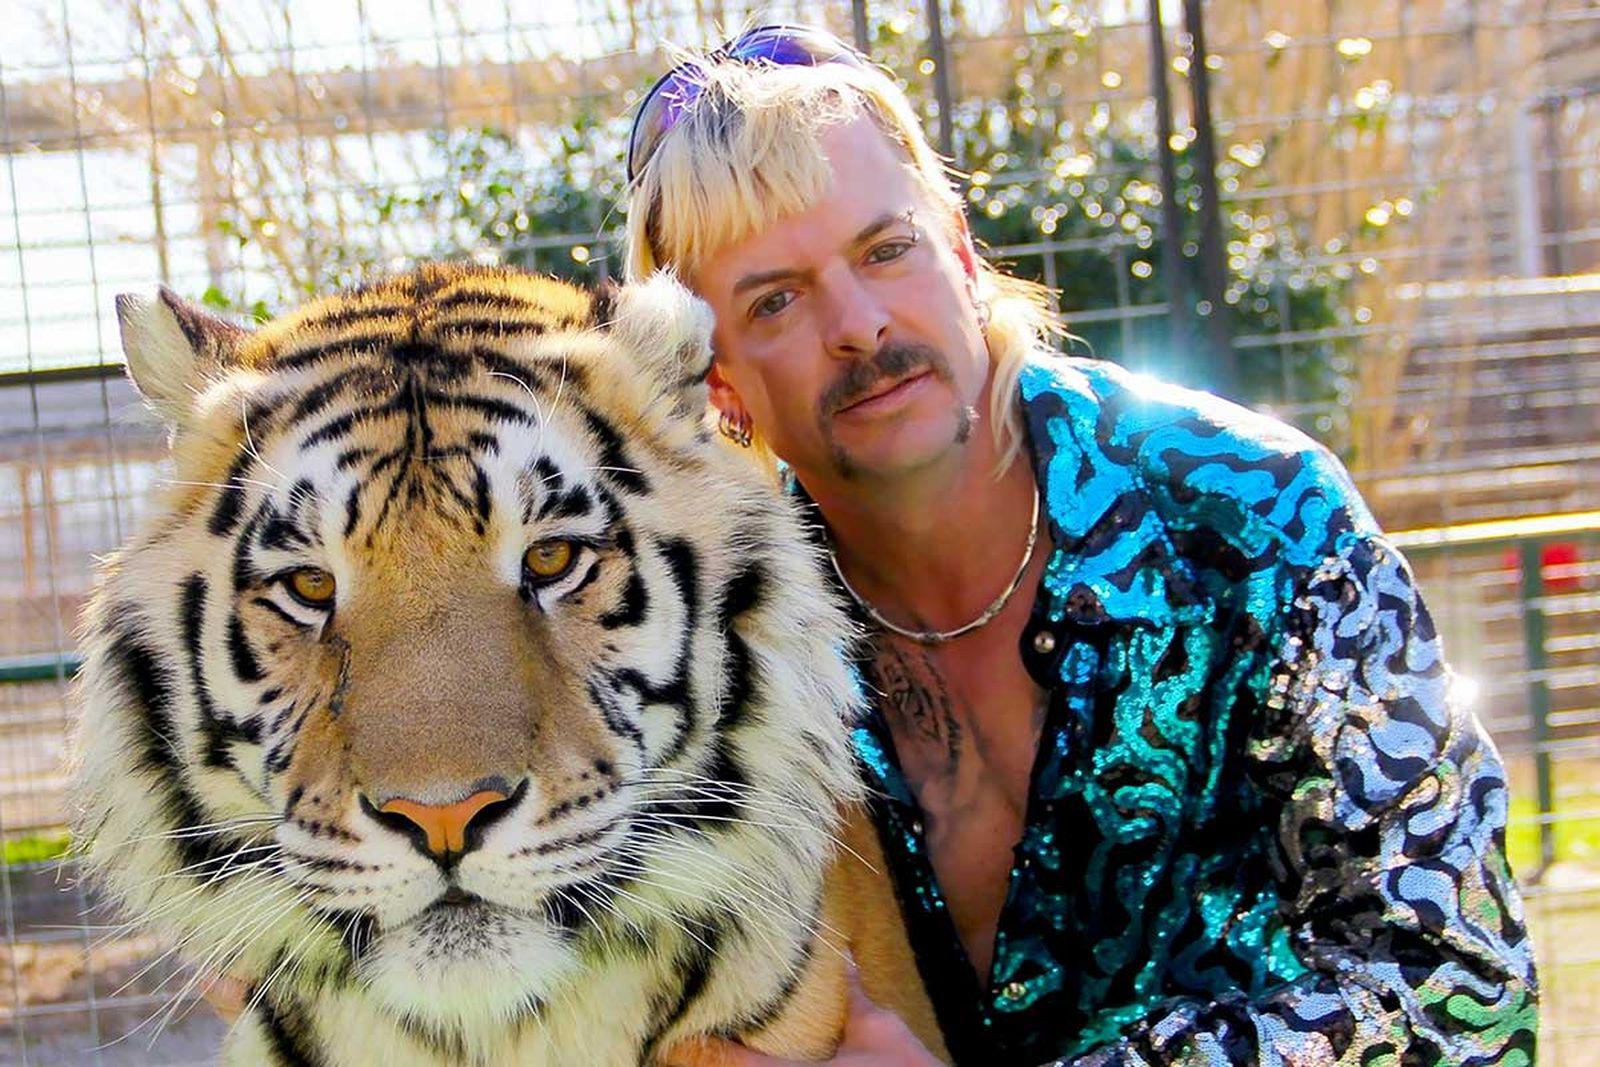 Netflix's 'Tiger King' trailer